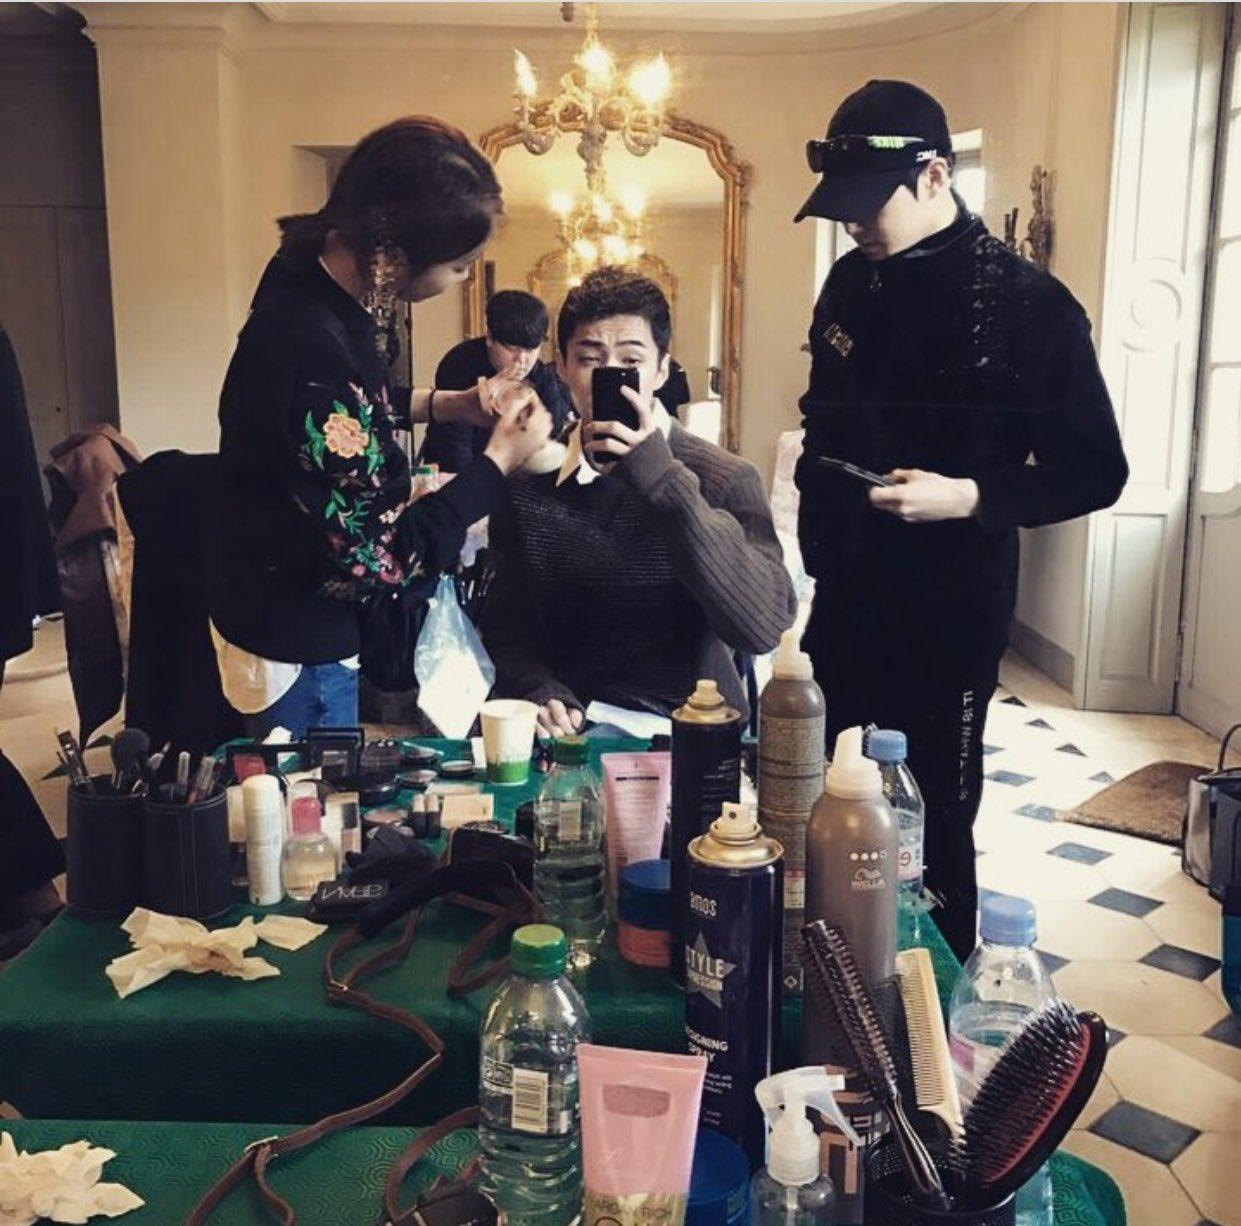 [TRANS] 170625 Sehun Instagram Updates